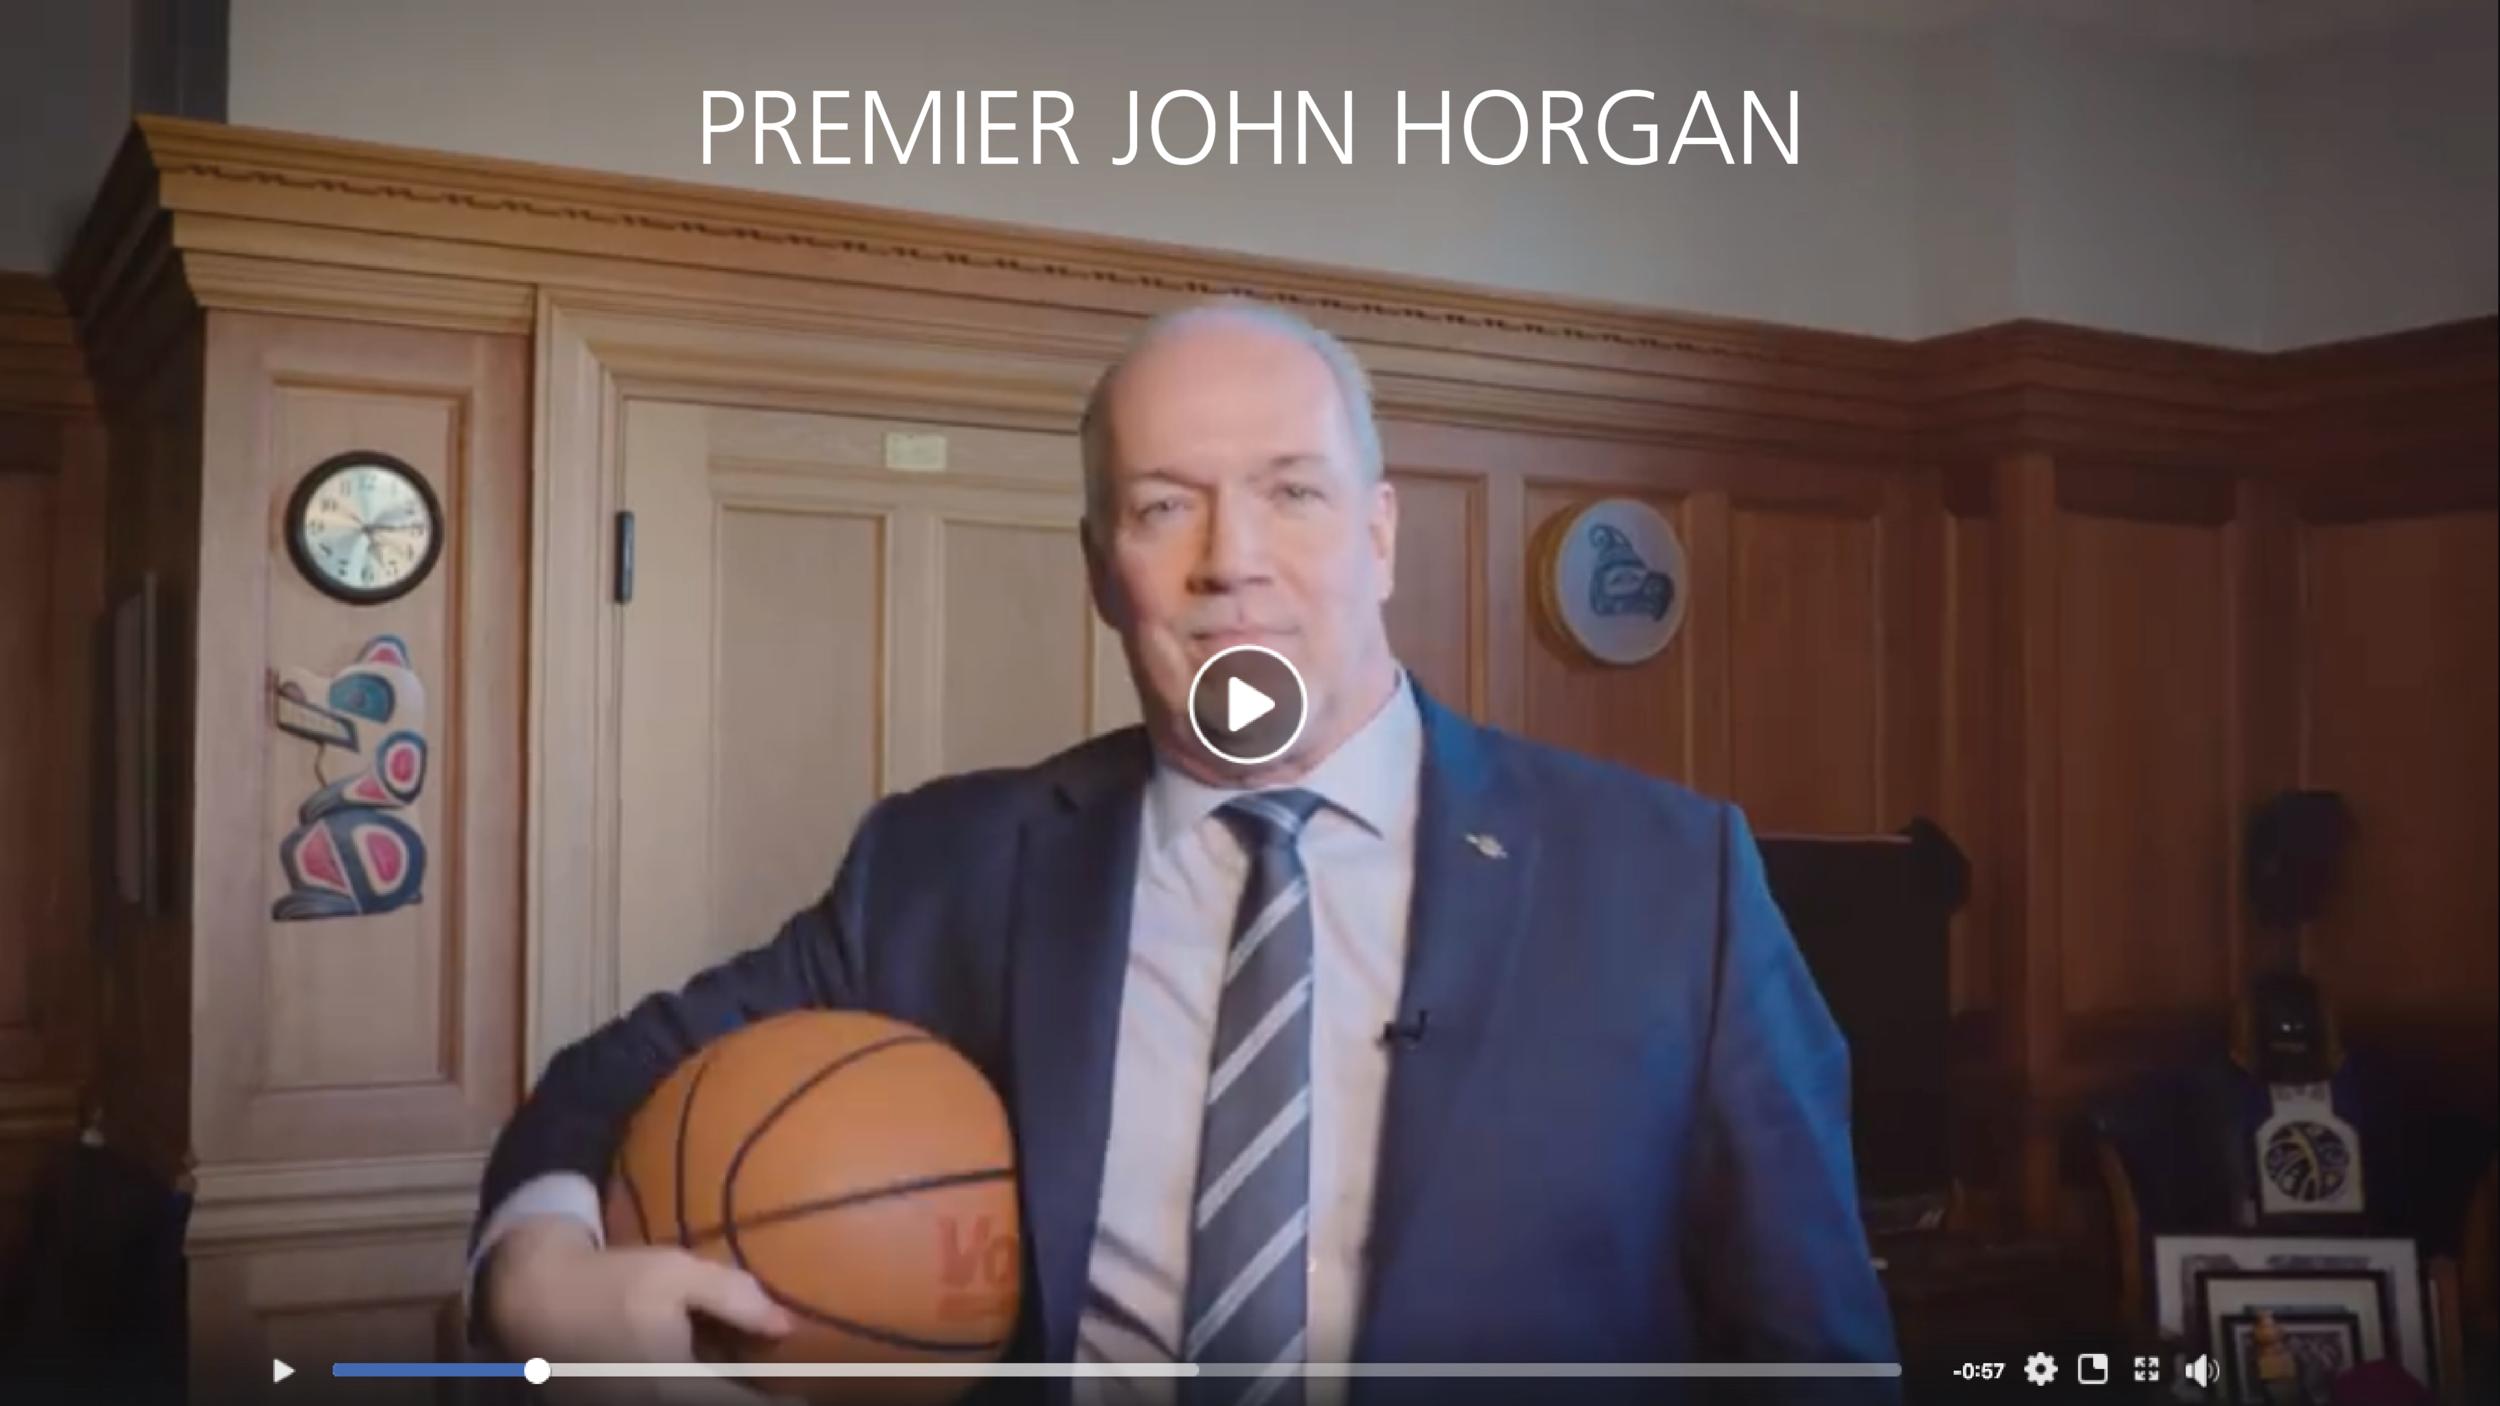 PREMIER JOHN HORGAN